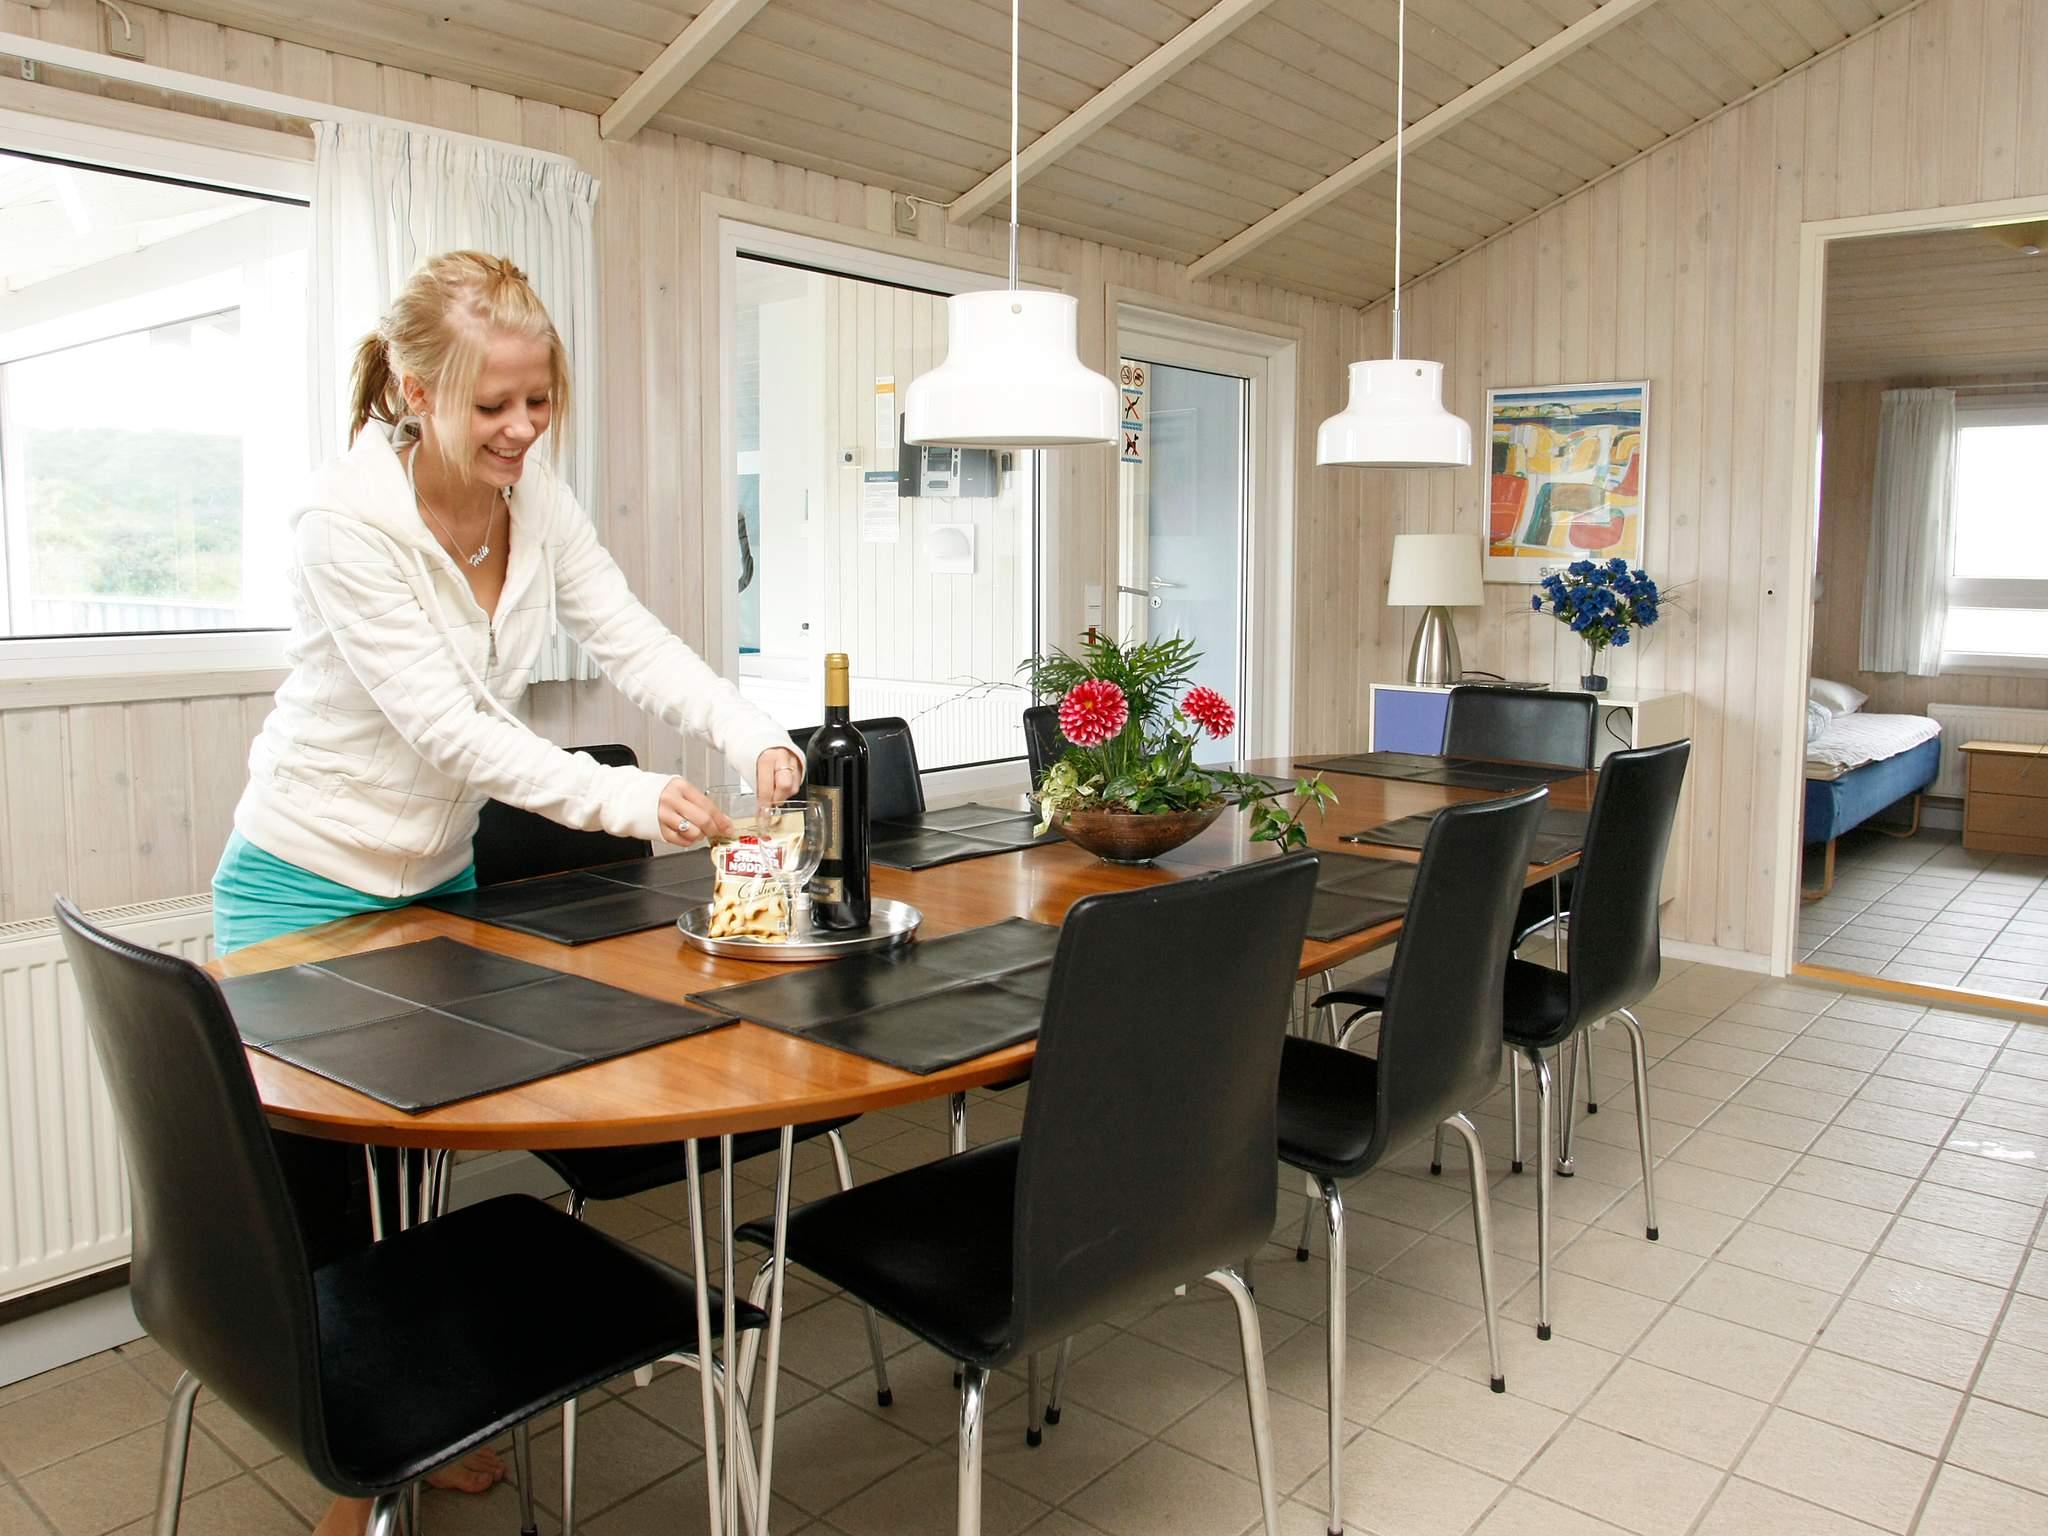 Ferienhaus Nørlev Strand (371057), Nørre Harritslev, , Nordwestjütland, Dänemark, Bild 3